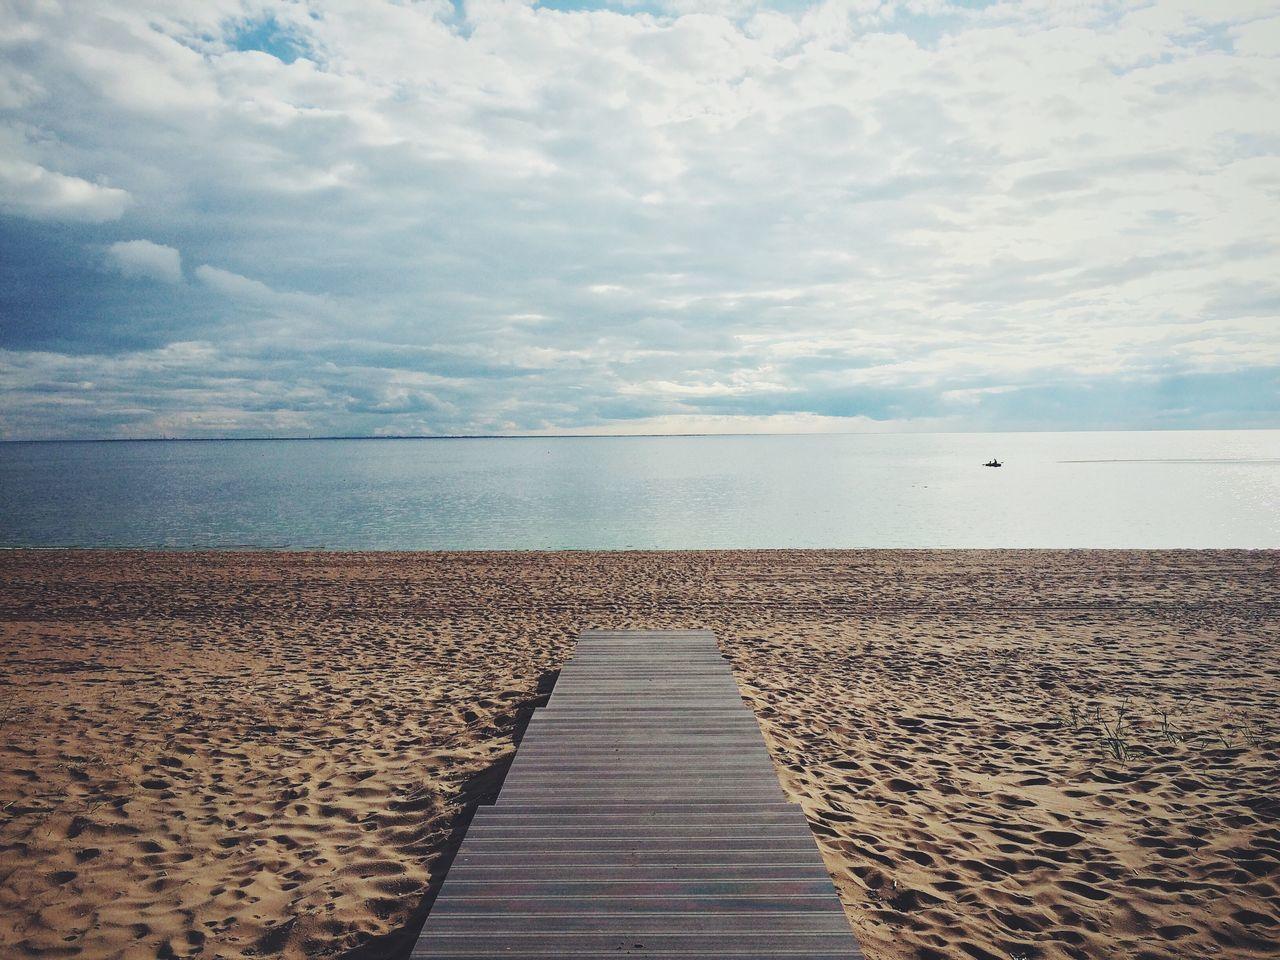 Russia Saint Petersburg Komarovo комарово Россия Санкт-Петербург Baltic Sea Sea Calm Calmness Learn & Shoot: Simplicity The Great Outdoors - 2016 EyeEm Awards